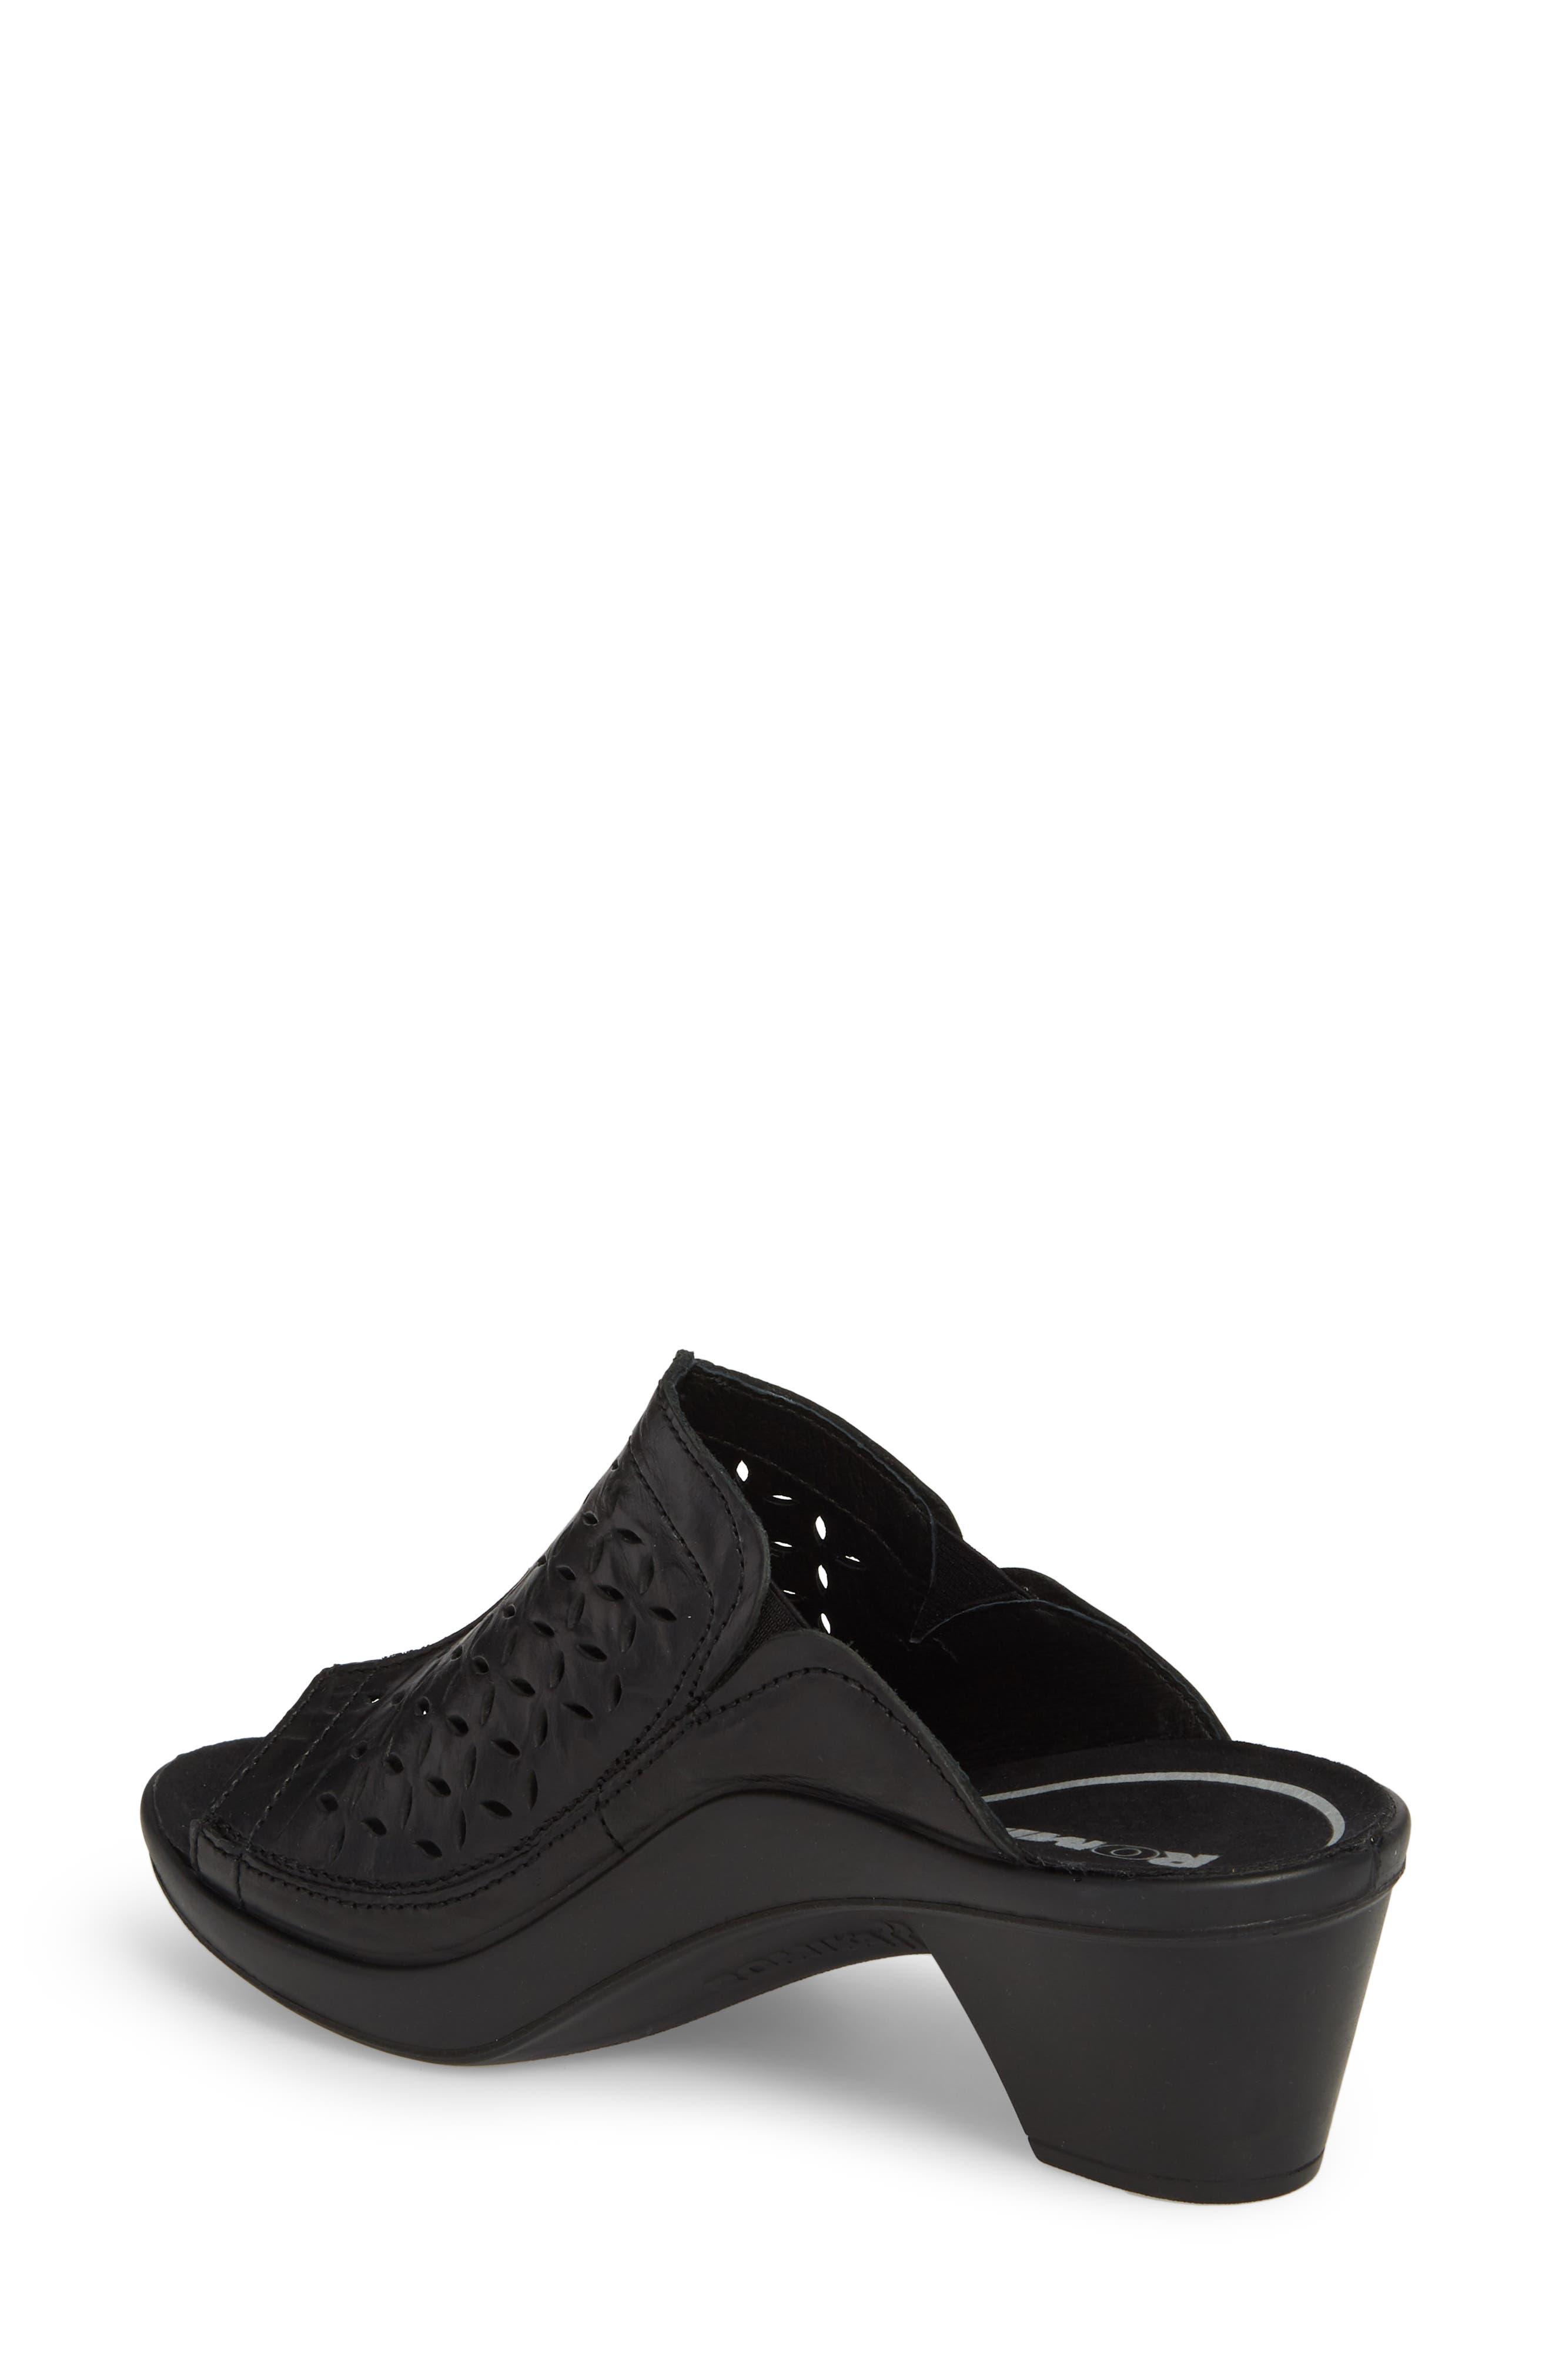 Mokassetta 326 Mule,                             Alternate thumbnail 2, color,                             Black Leather